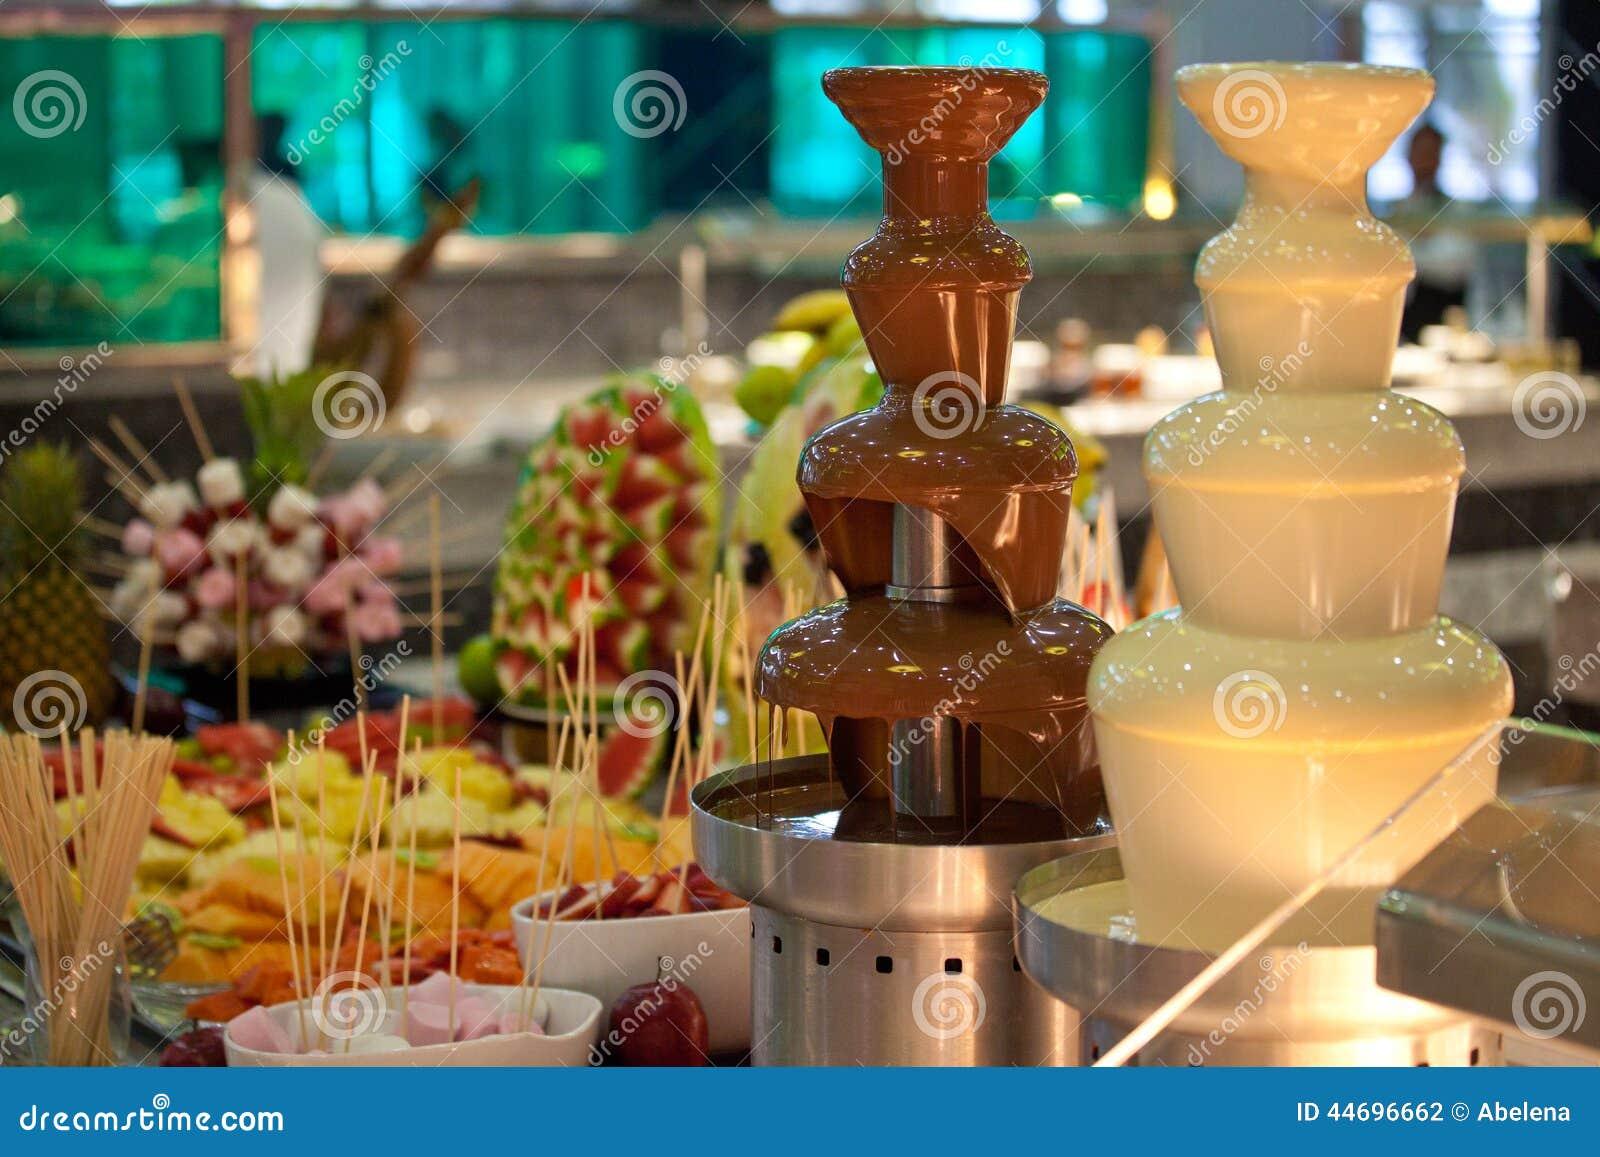 Chocolate Fondue Stock Photo - Image: 44696662